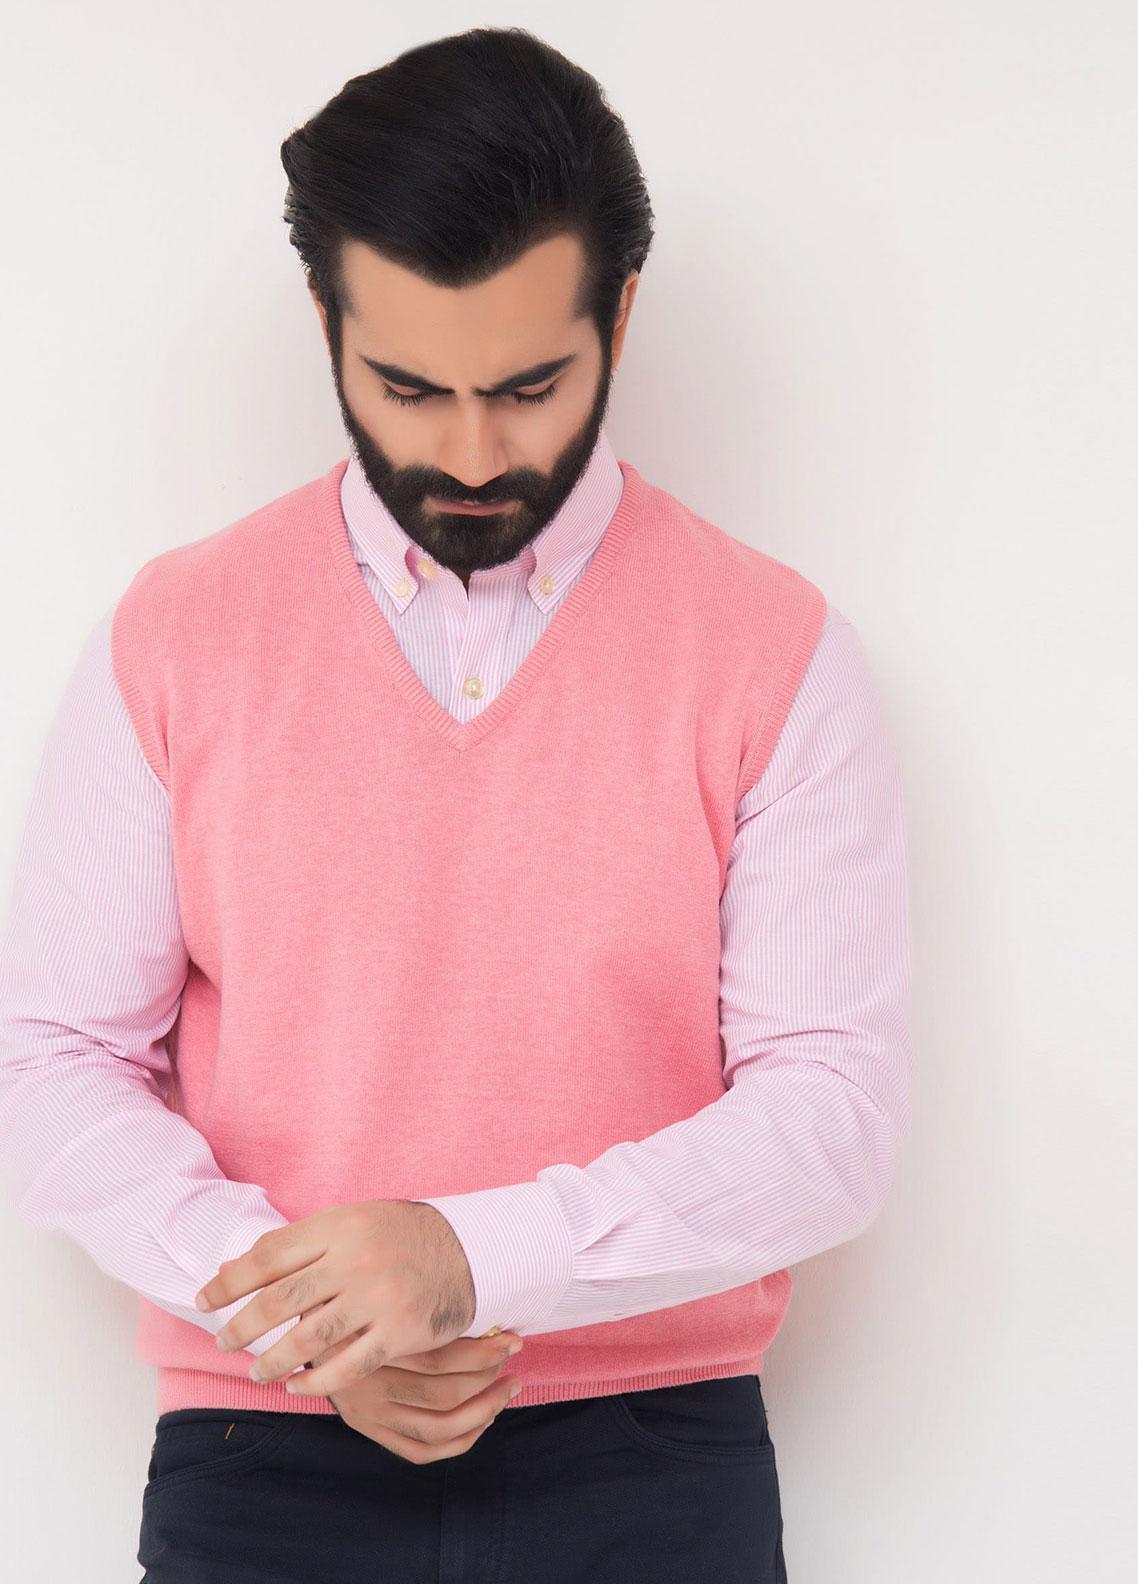 Brumano Cotton Sleeveless V-Neck Sweaters for Men - Pink SL-550